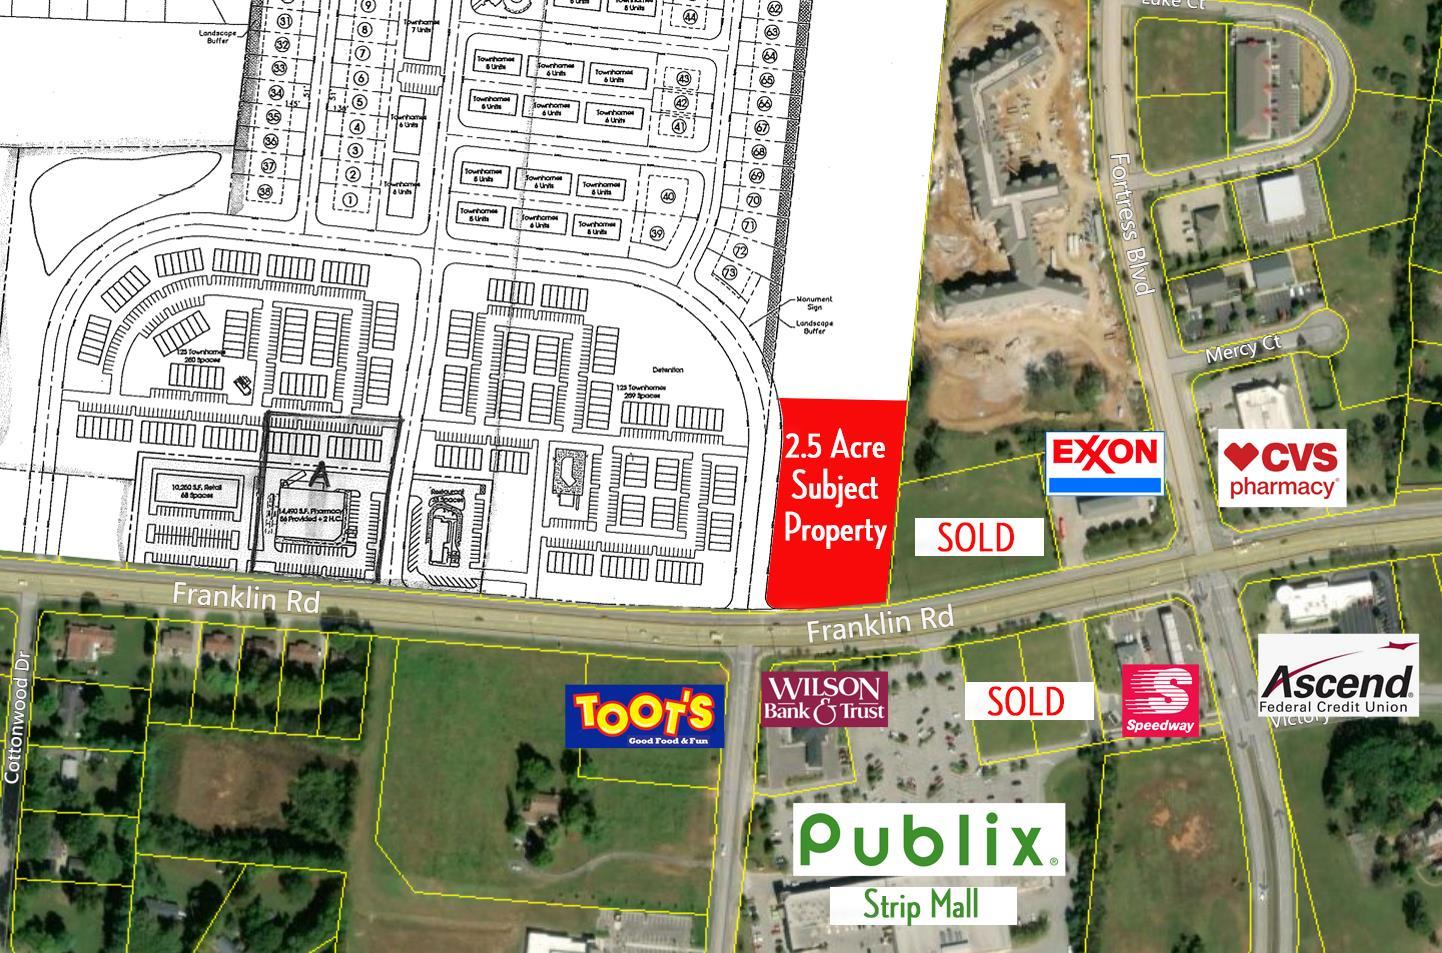 4620 Franklin Rd, Murfreesboro, TN 37128 - Murfreesboro, TN real estate listing